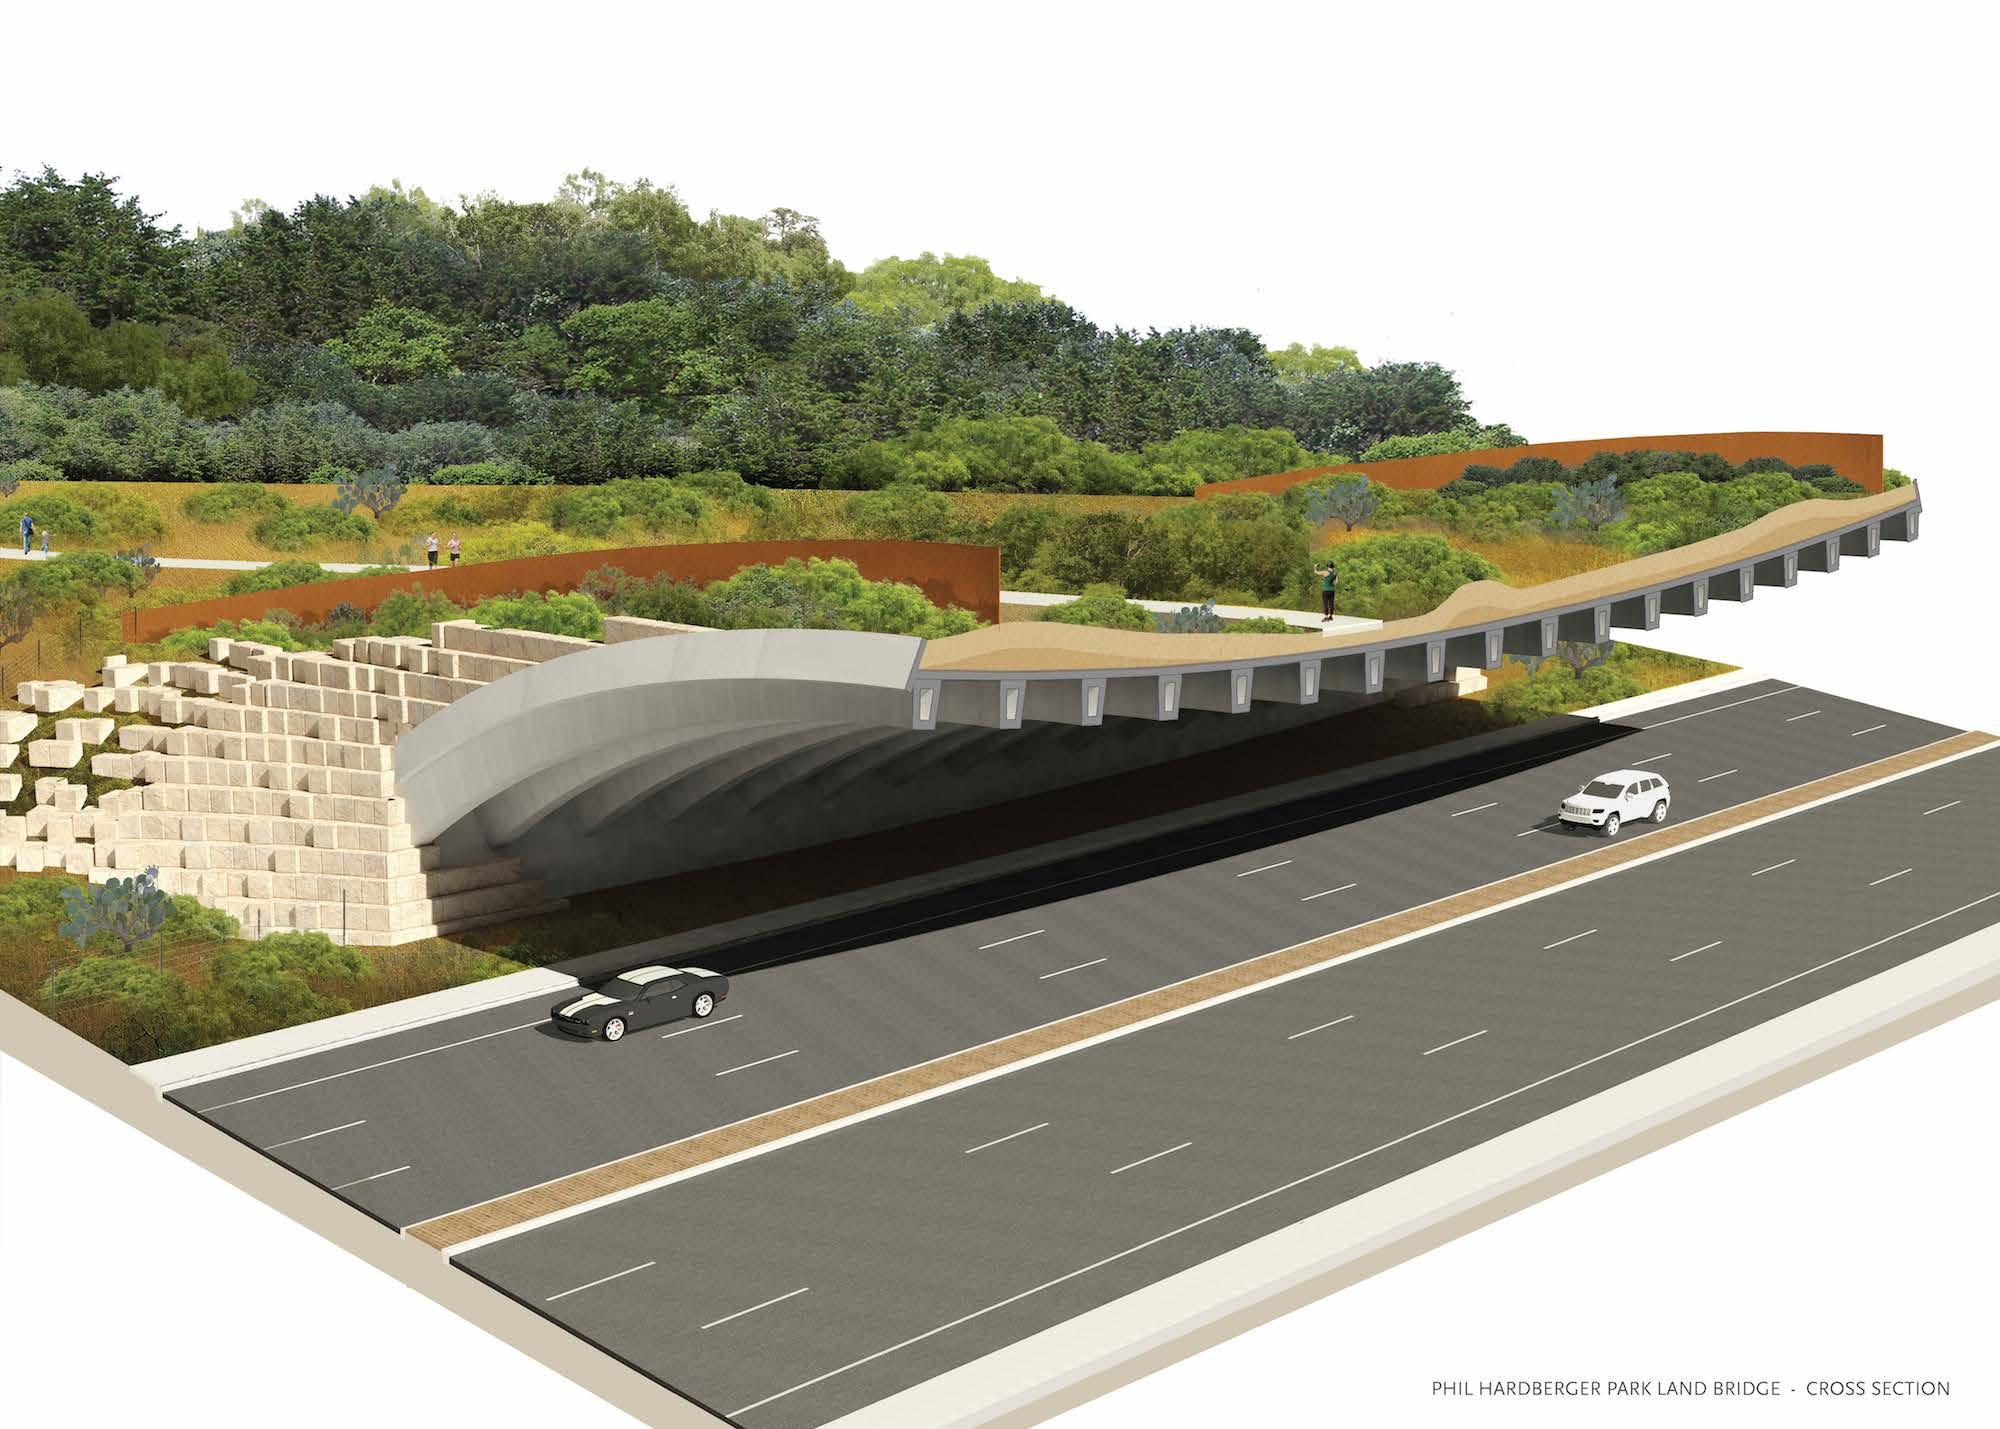 A cross section of the Phil Hardberger Park land bridge.